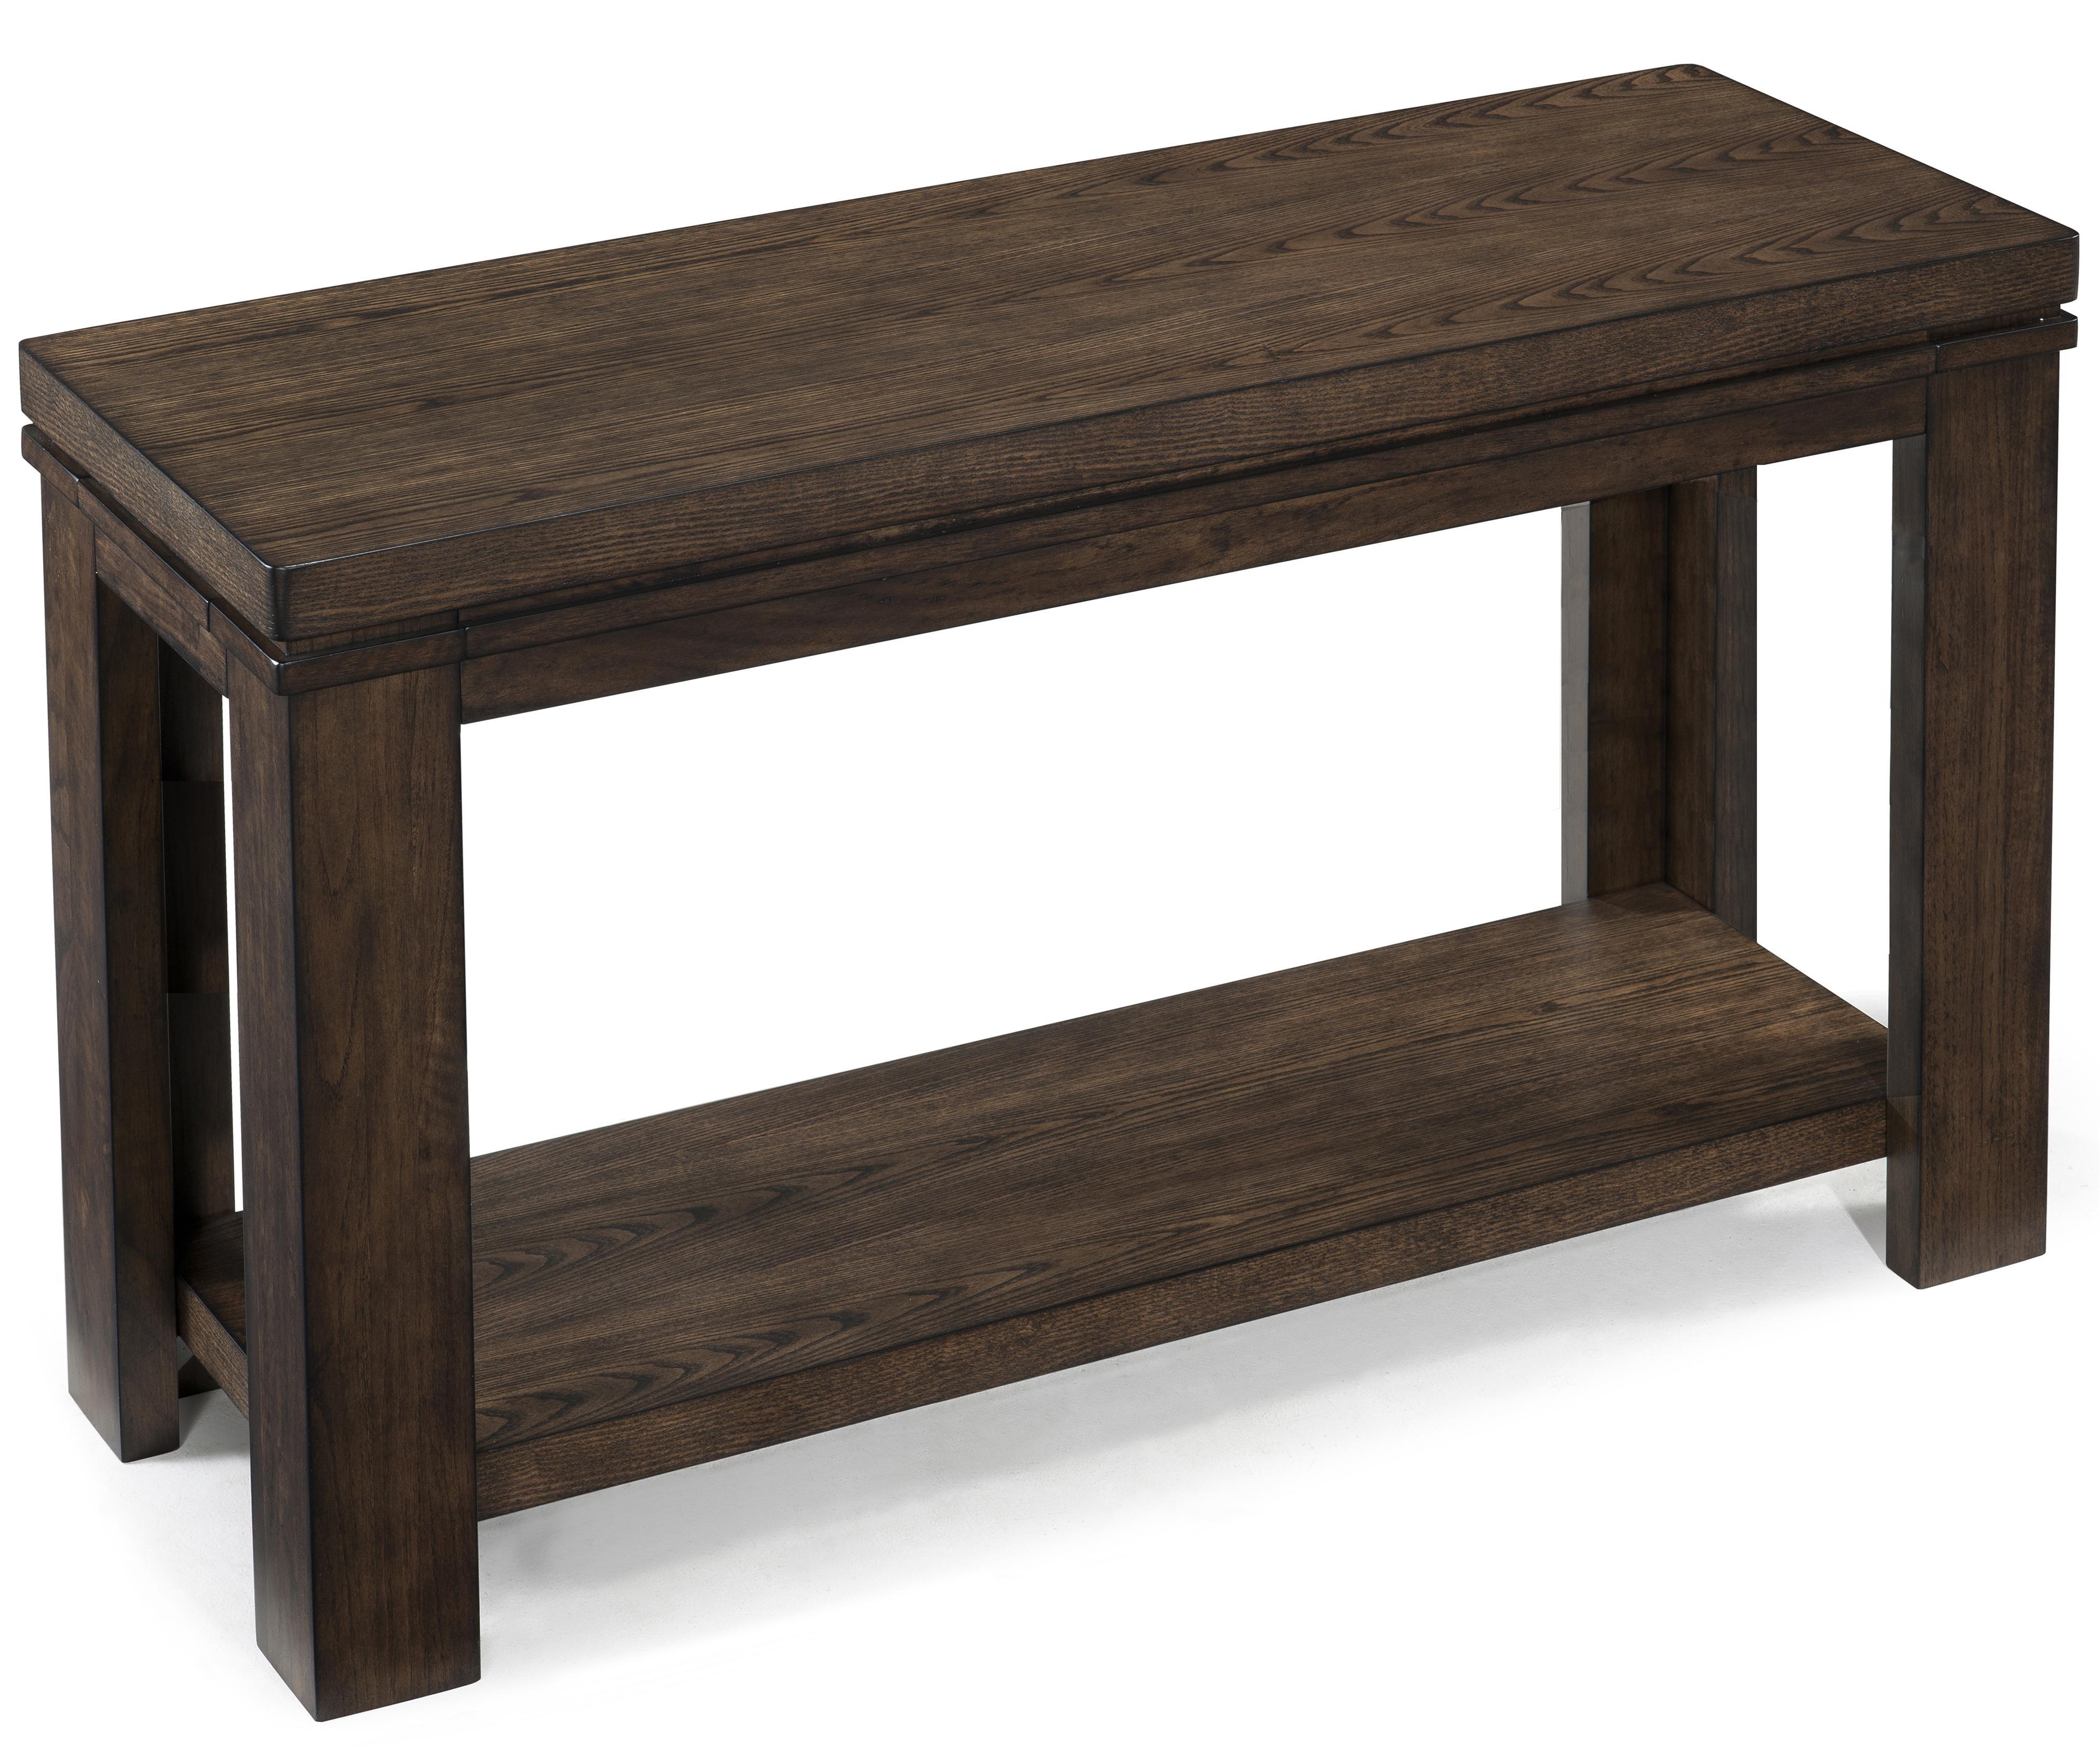 Magnussen Home Harbridge Rectangular Sofa Table - Item Number: T2284-73